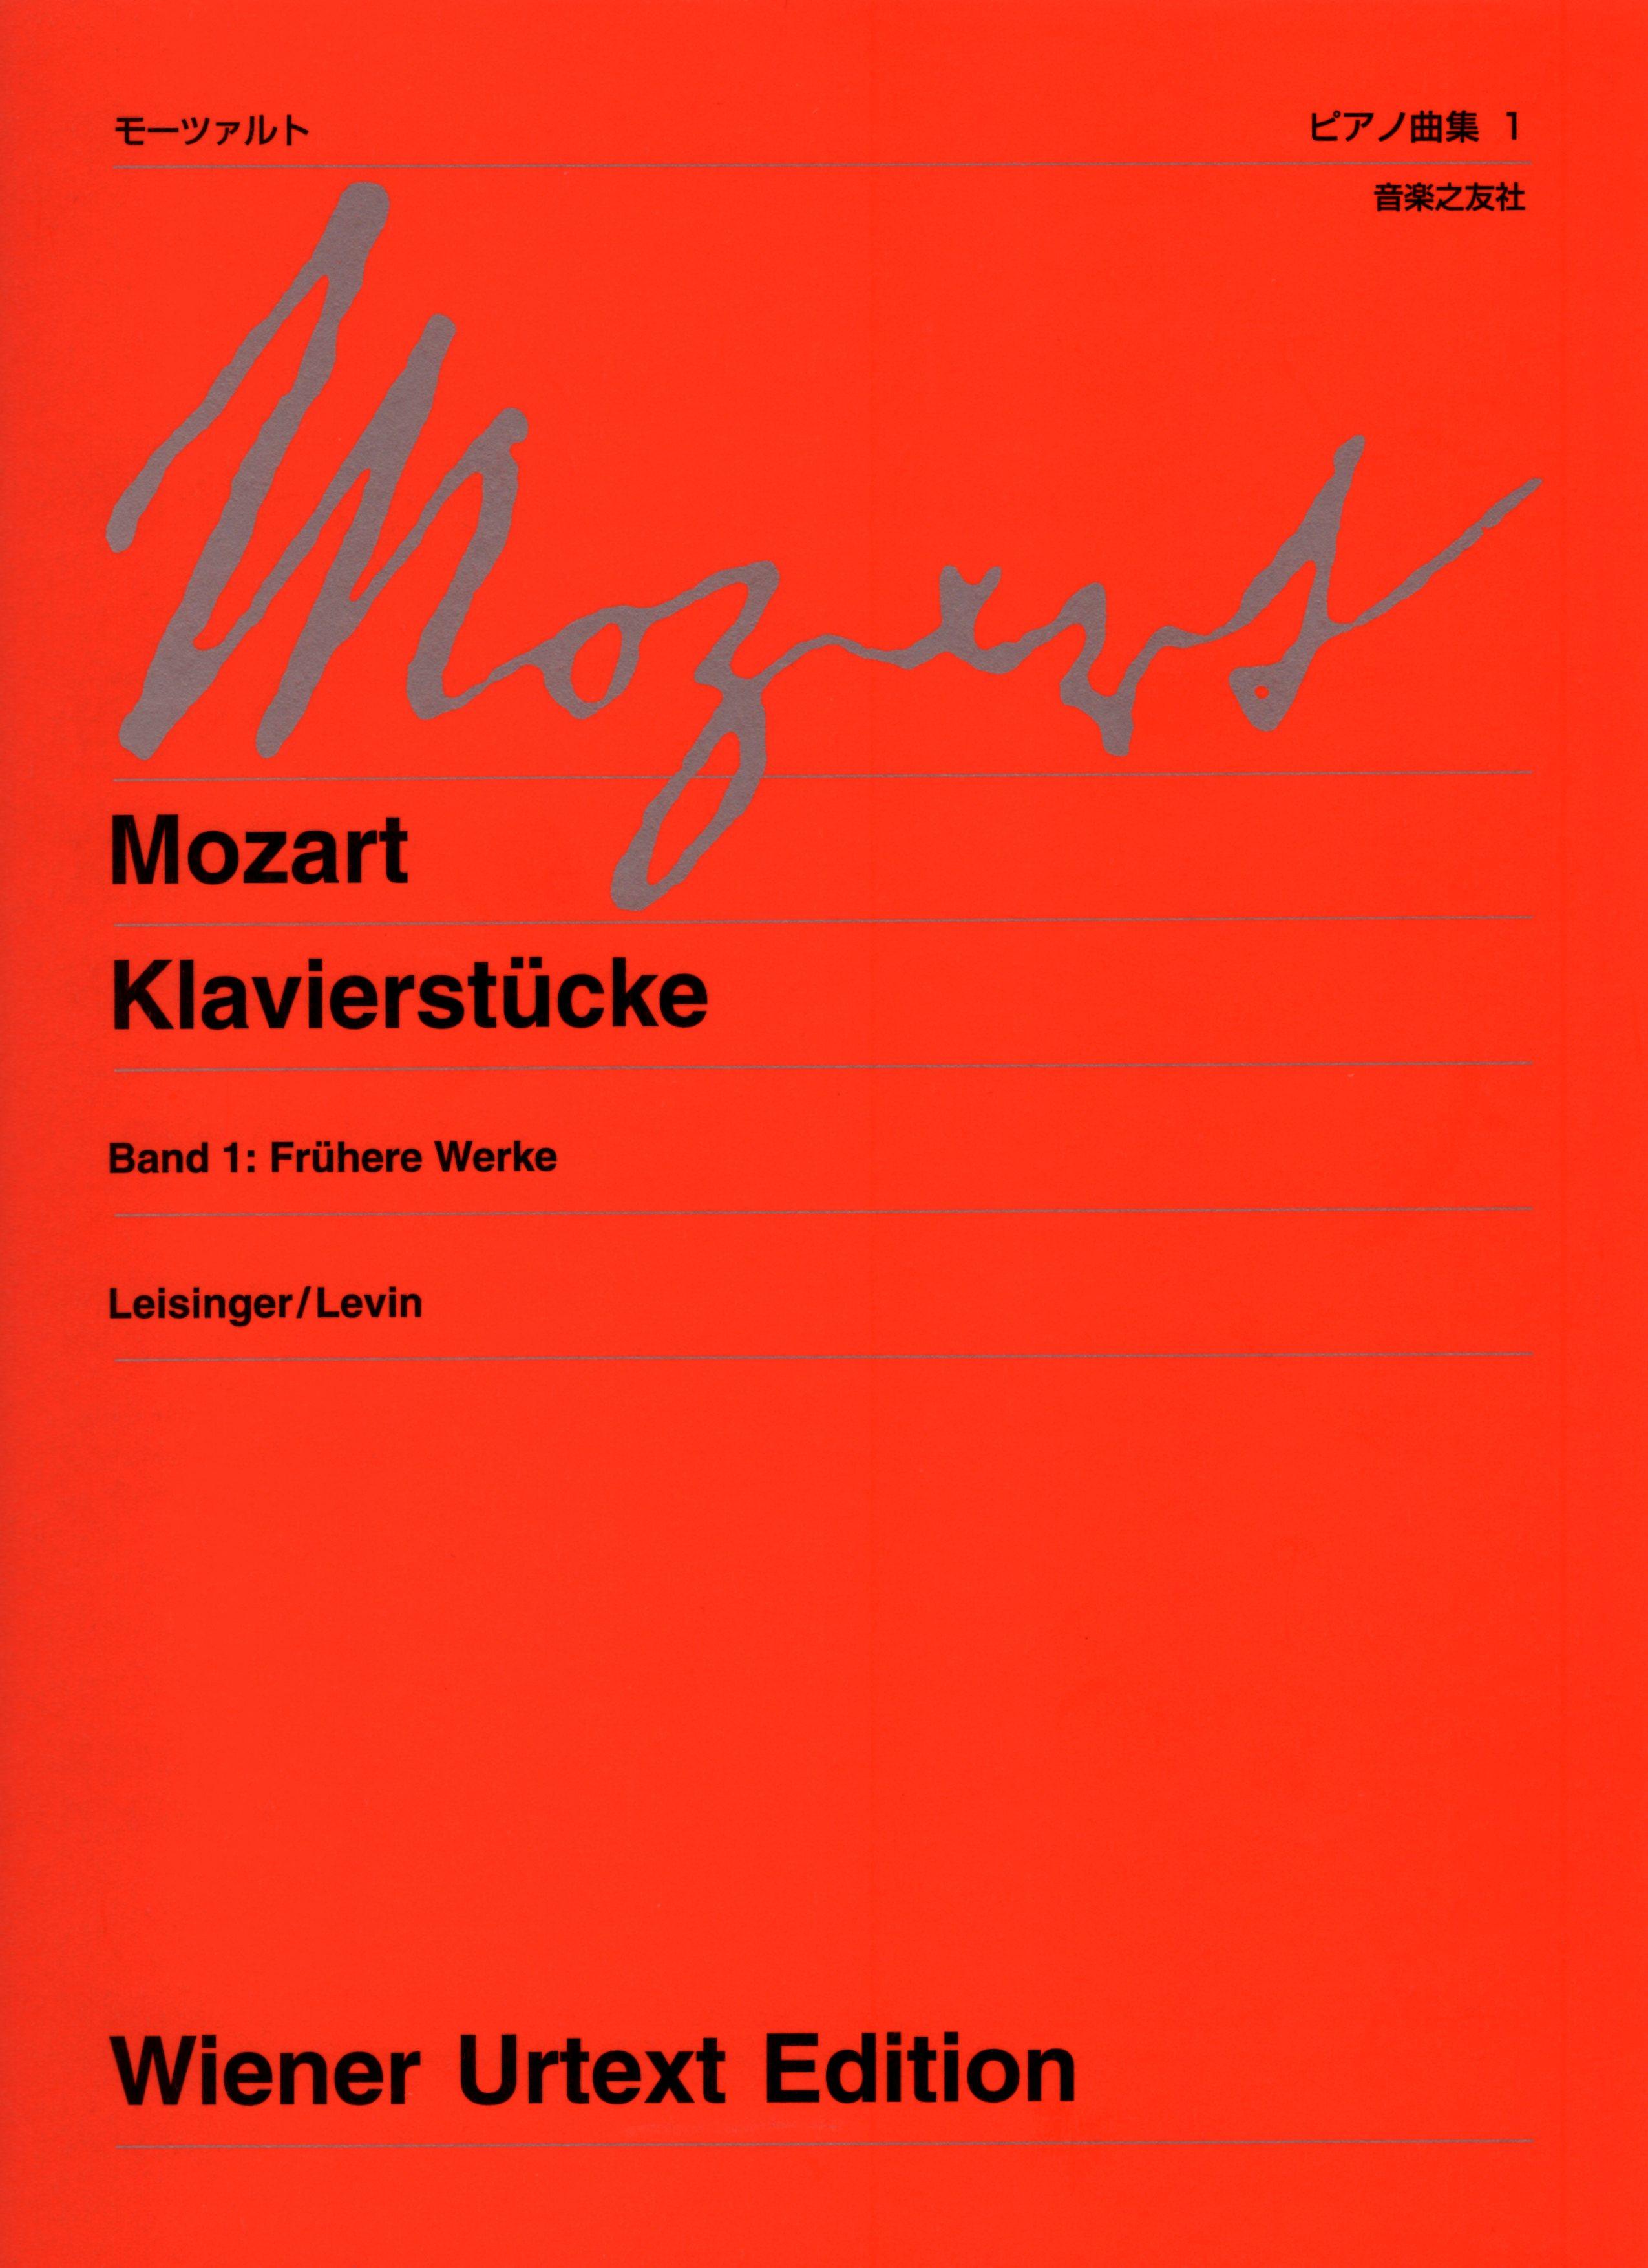 【鋼琴獨奏樂譜】維也納原典版 莫札特 鋼琴作品 第一冊: 早期作品 MOZART Klavierstucke band 1: frugere werke ウィーン原典版 229a ピアノ曲集 1